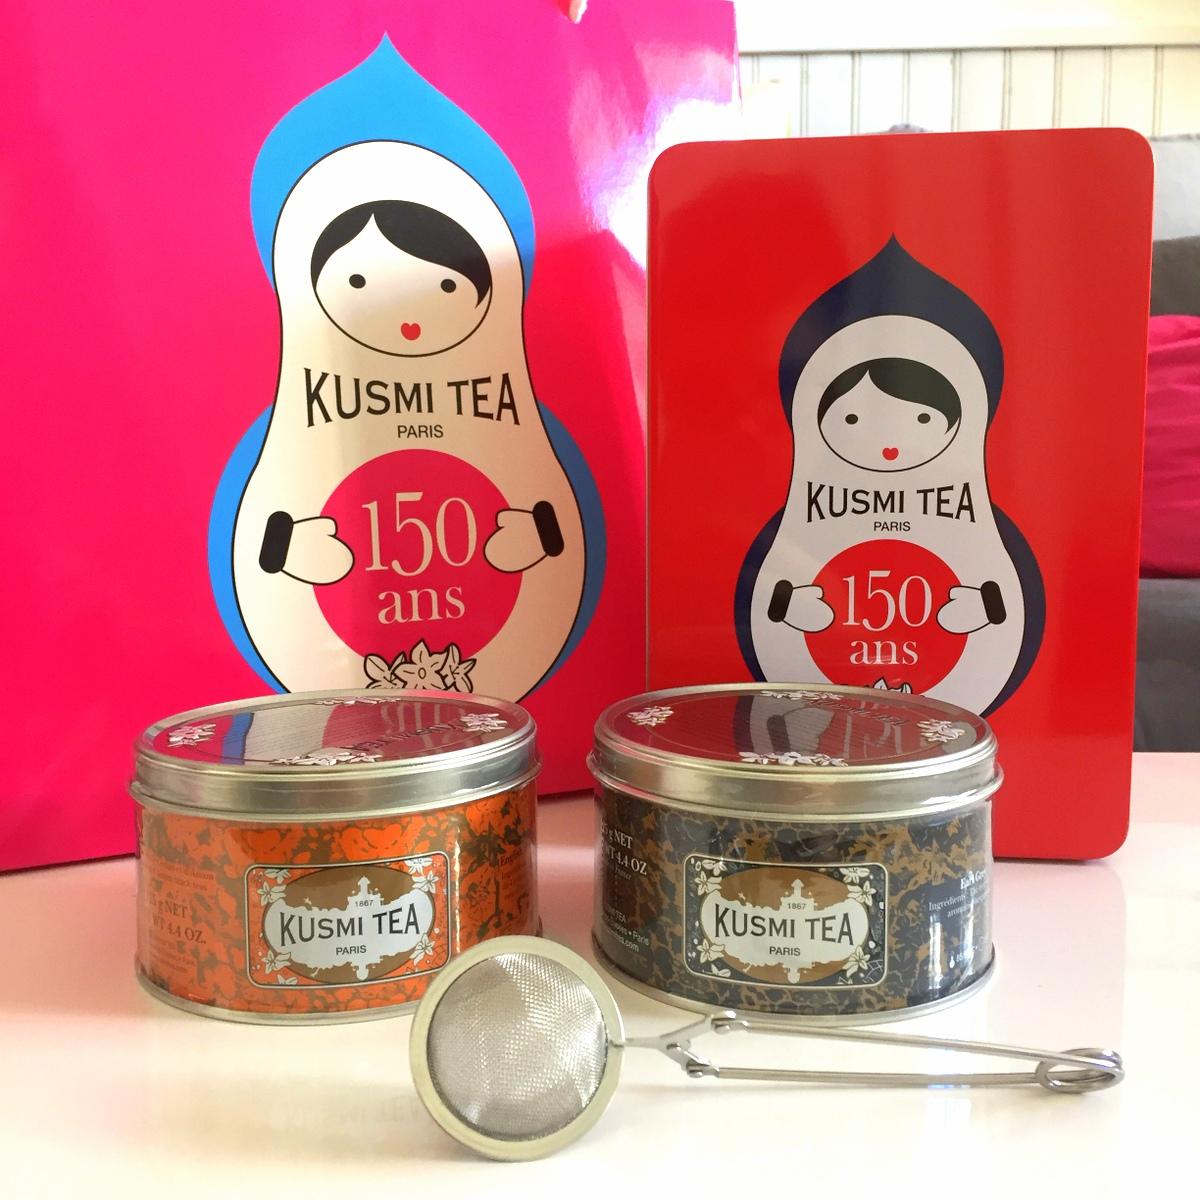 Concours Kusmi tea - Le blog de Lili